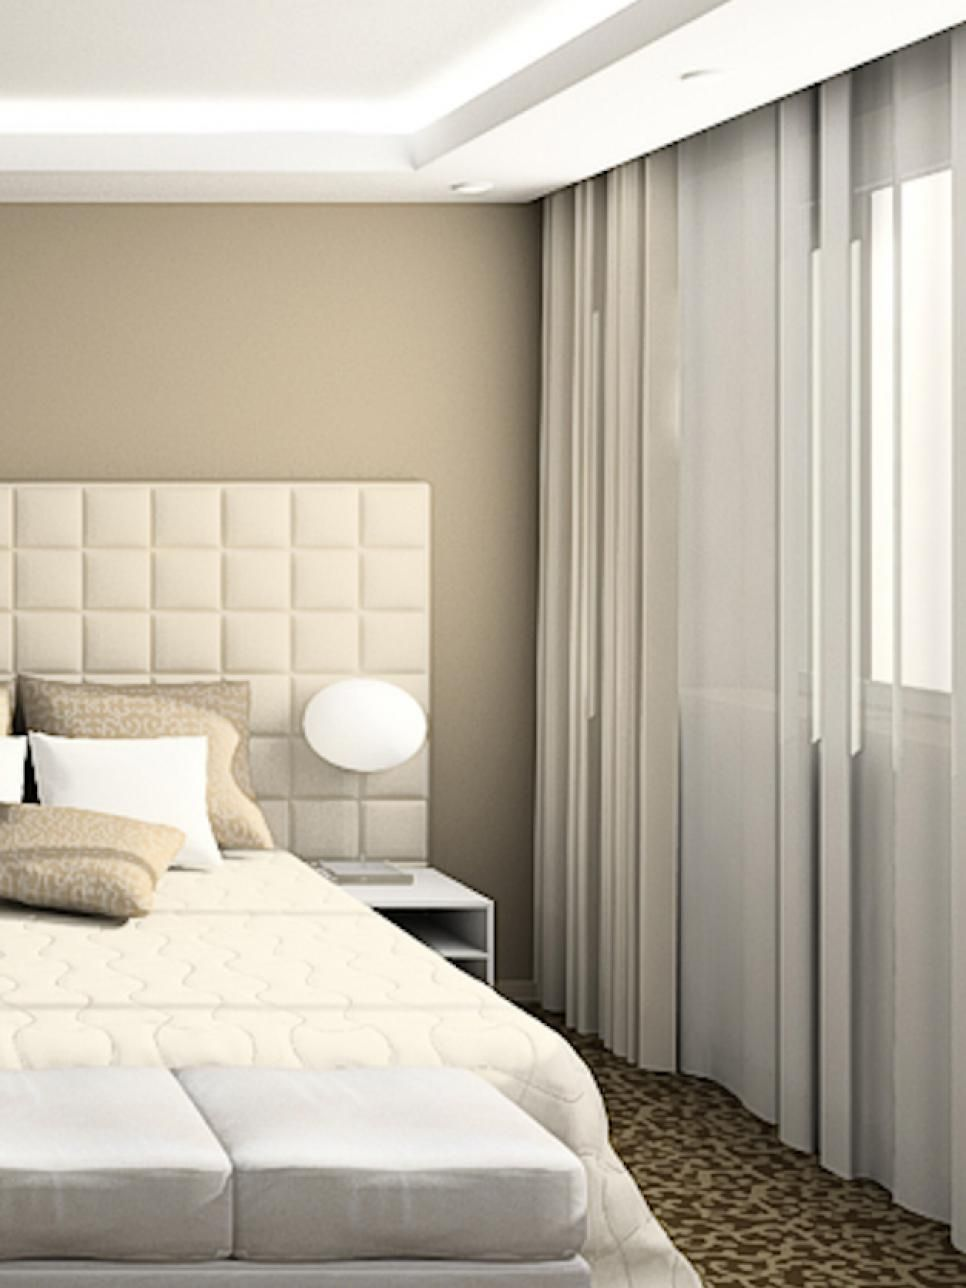 Bedroom window ideas  ideas for bedroom curtains  bedroom window treatment ideas check